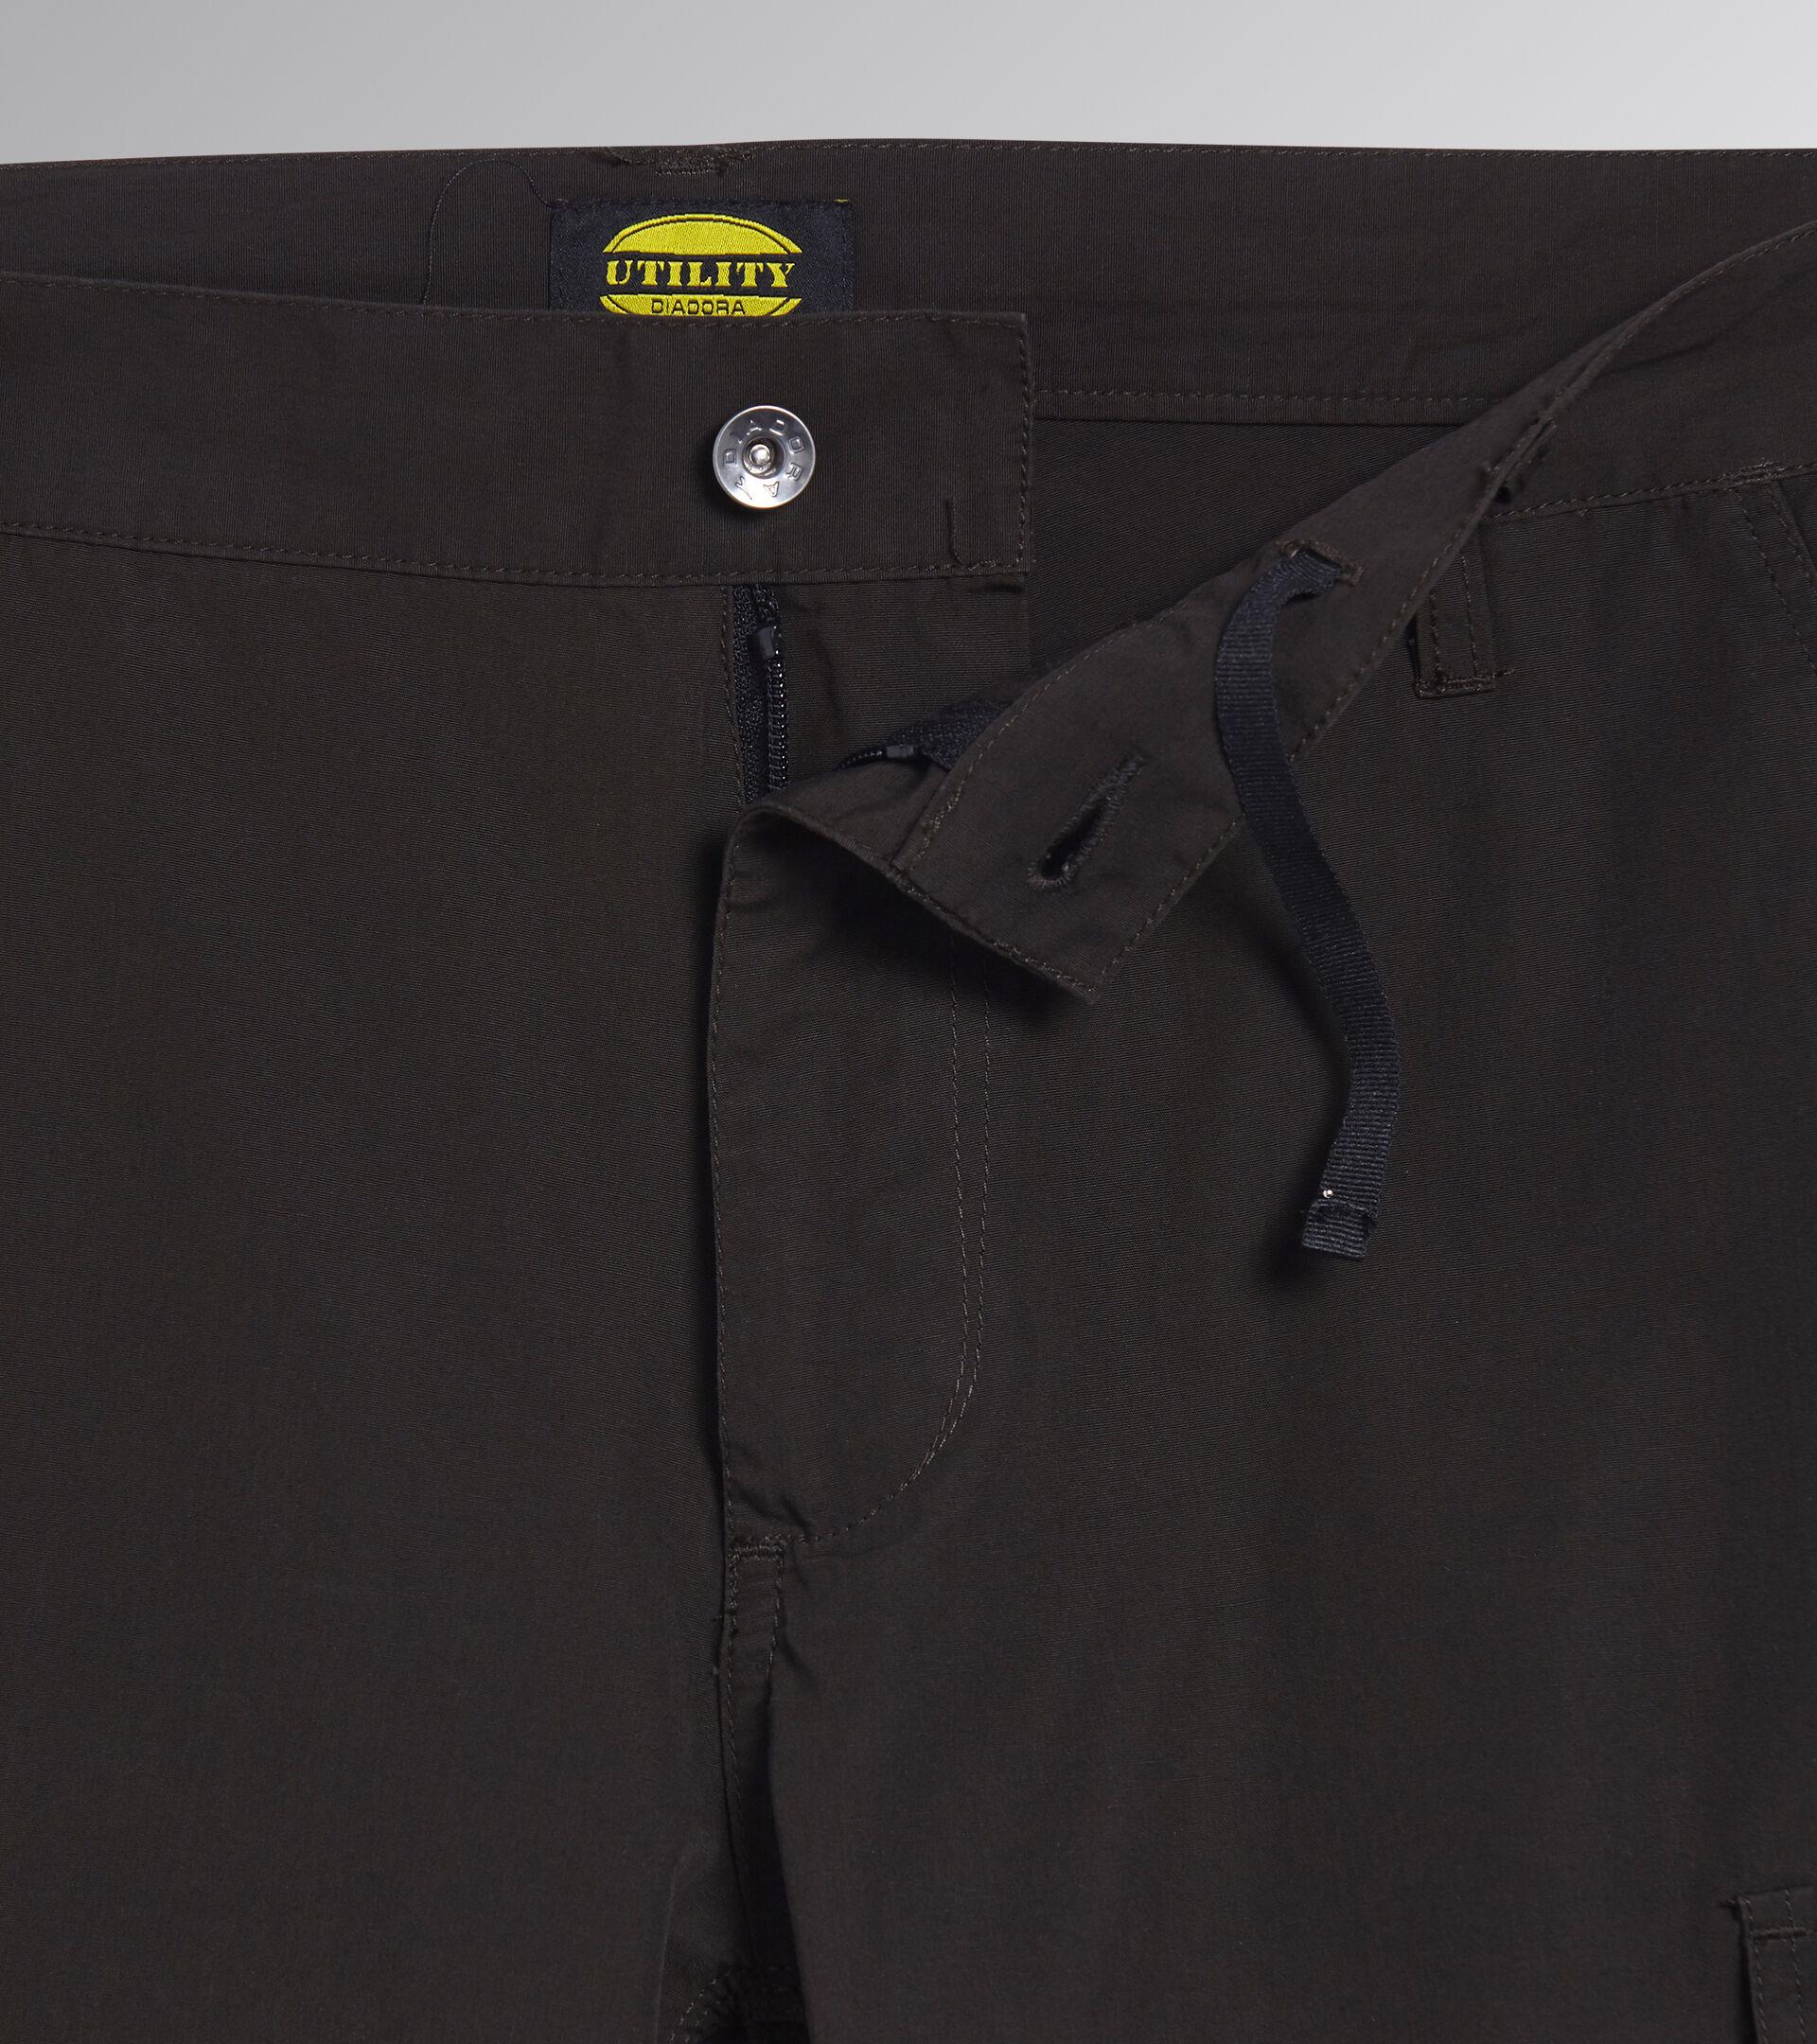 Apparel Utility UOMO PANT WIN CARGO BLACK FIR GREEN Utility